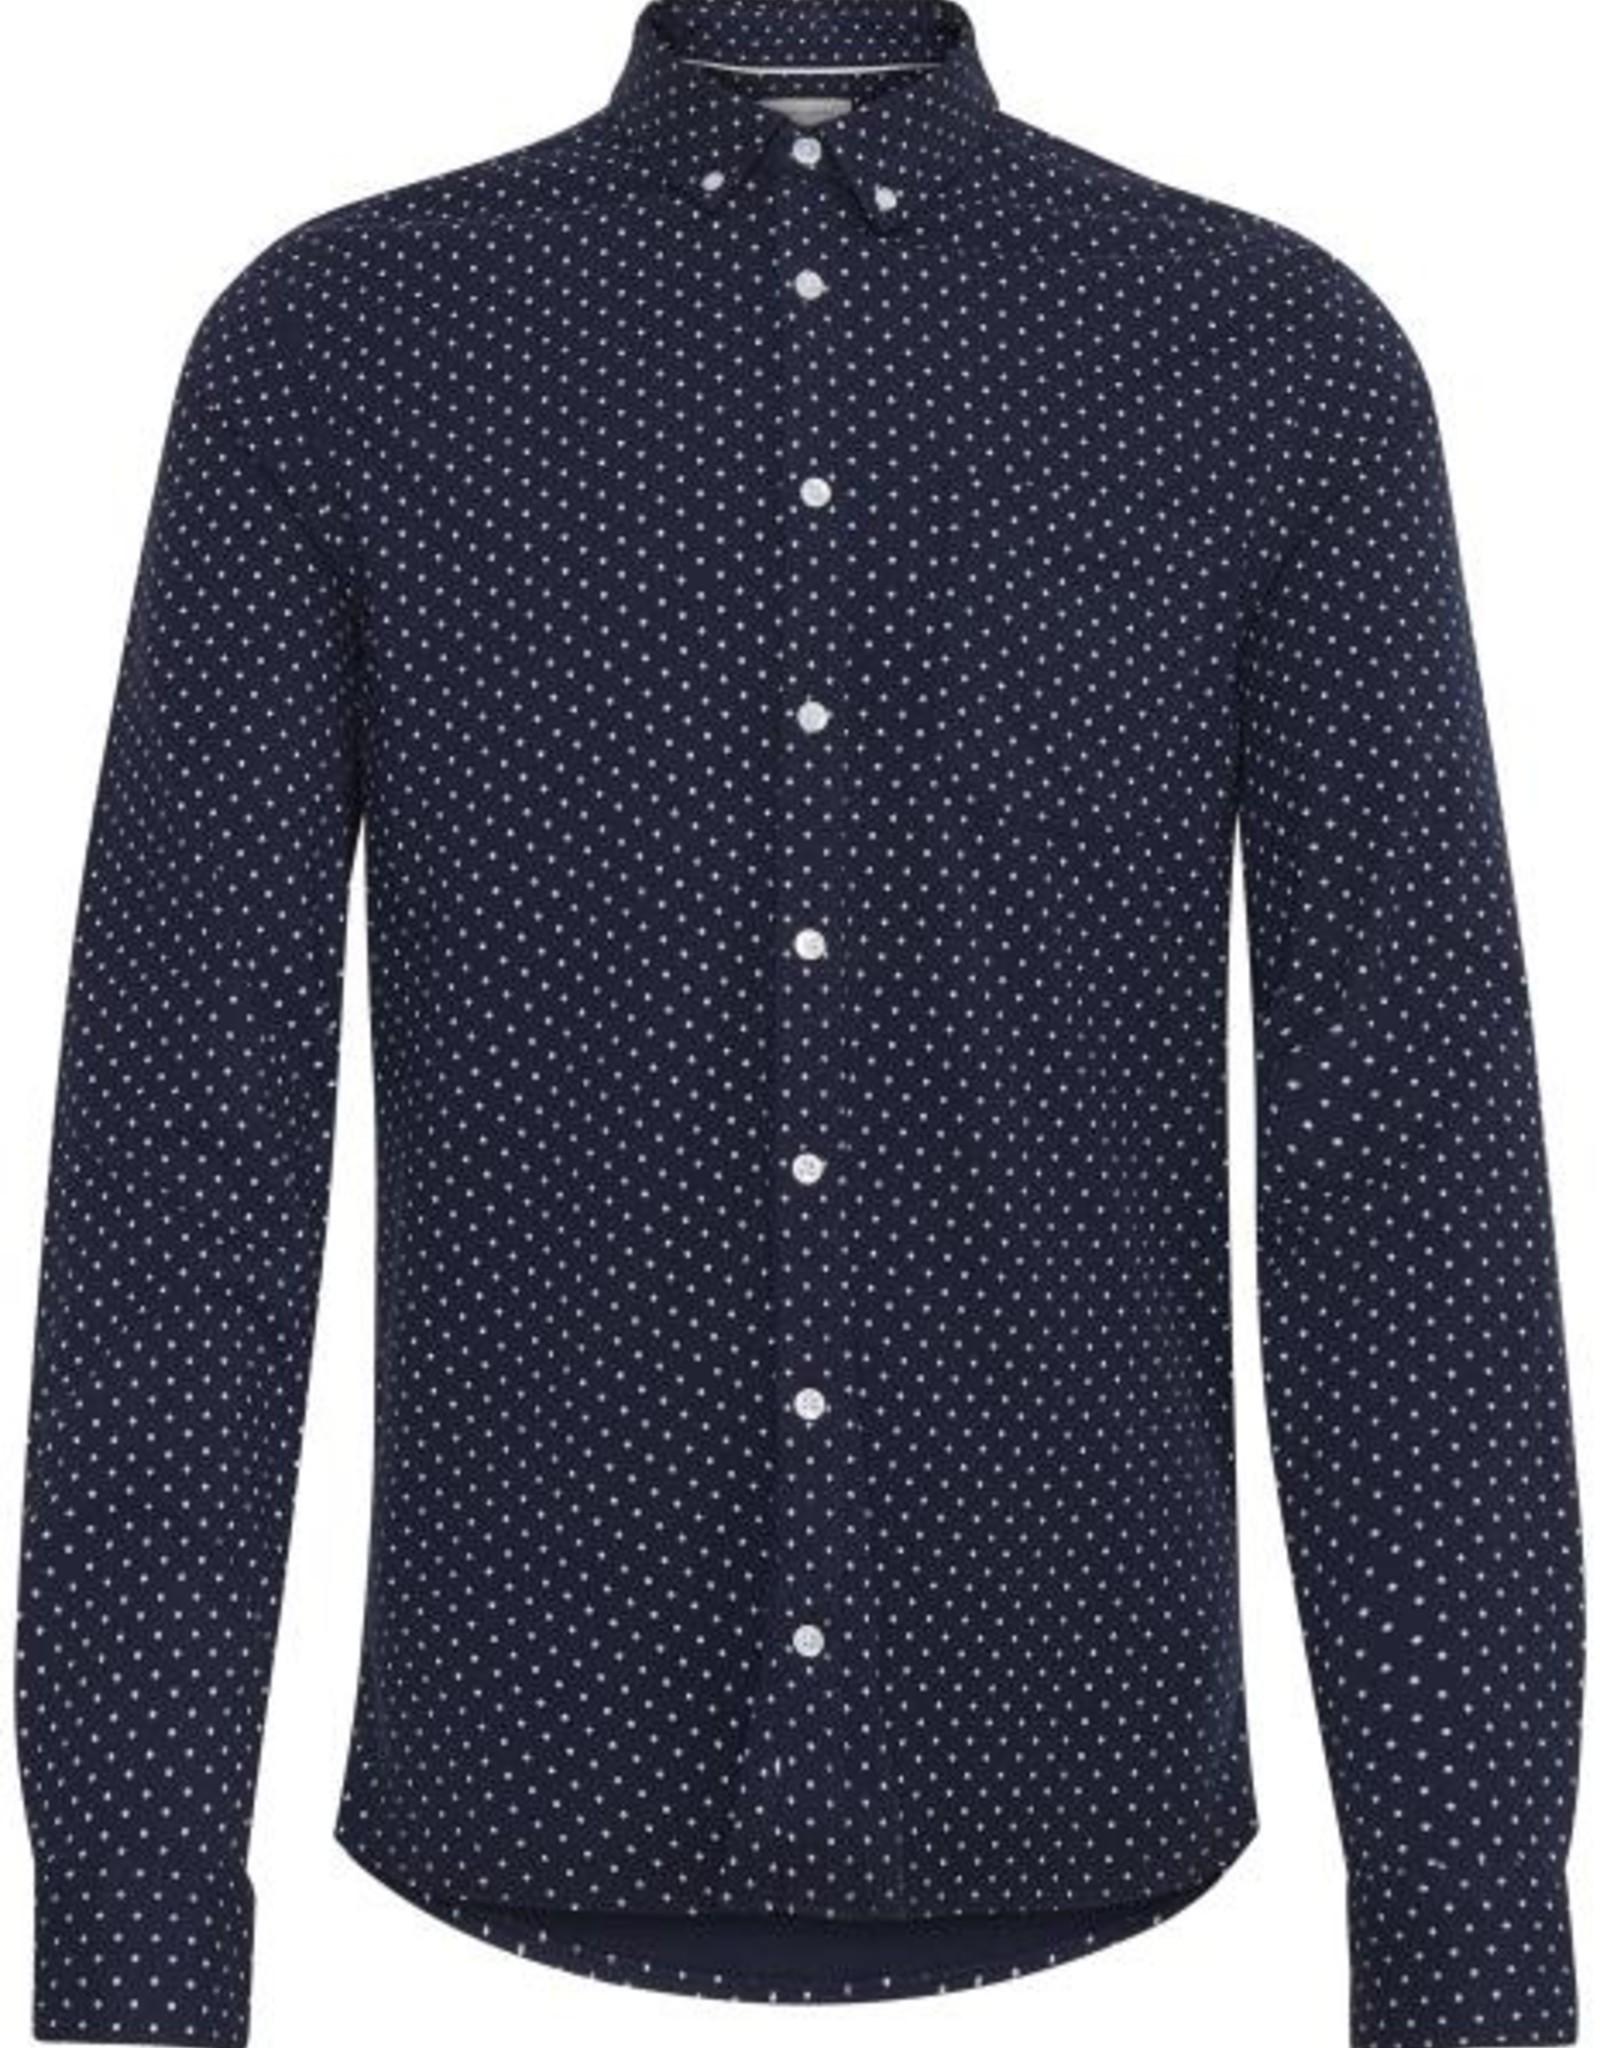 Casual Friday Casual Friday-Arthur Shirt